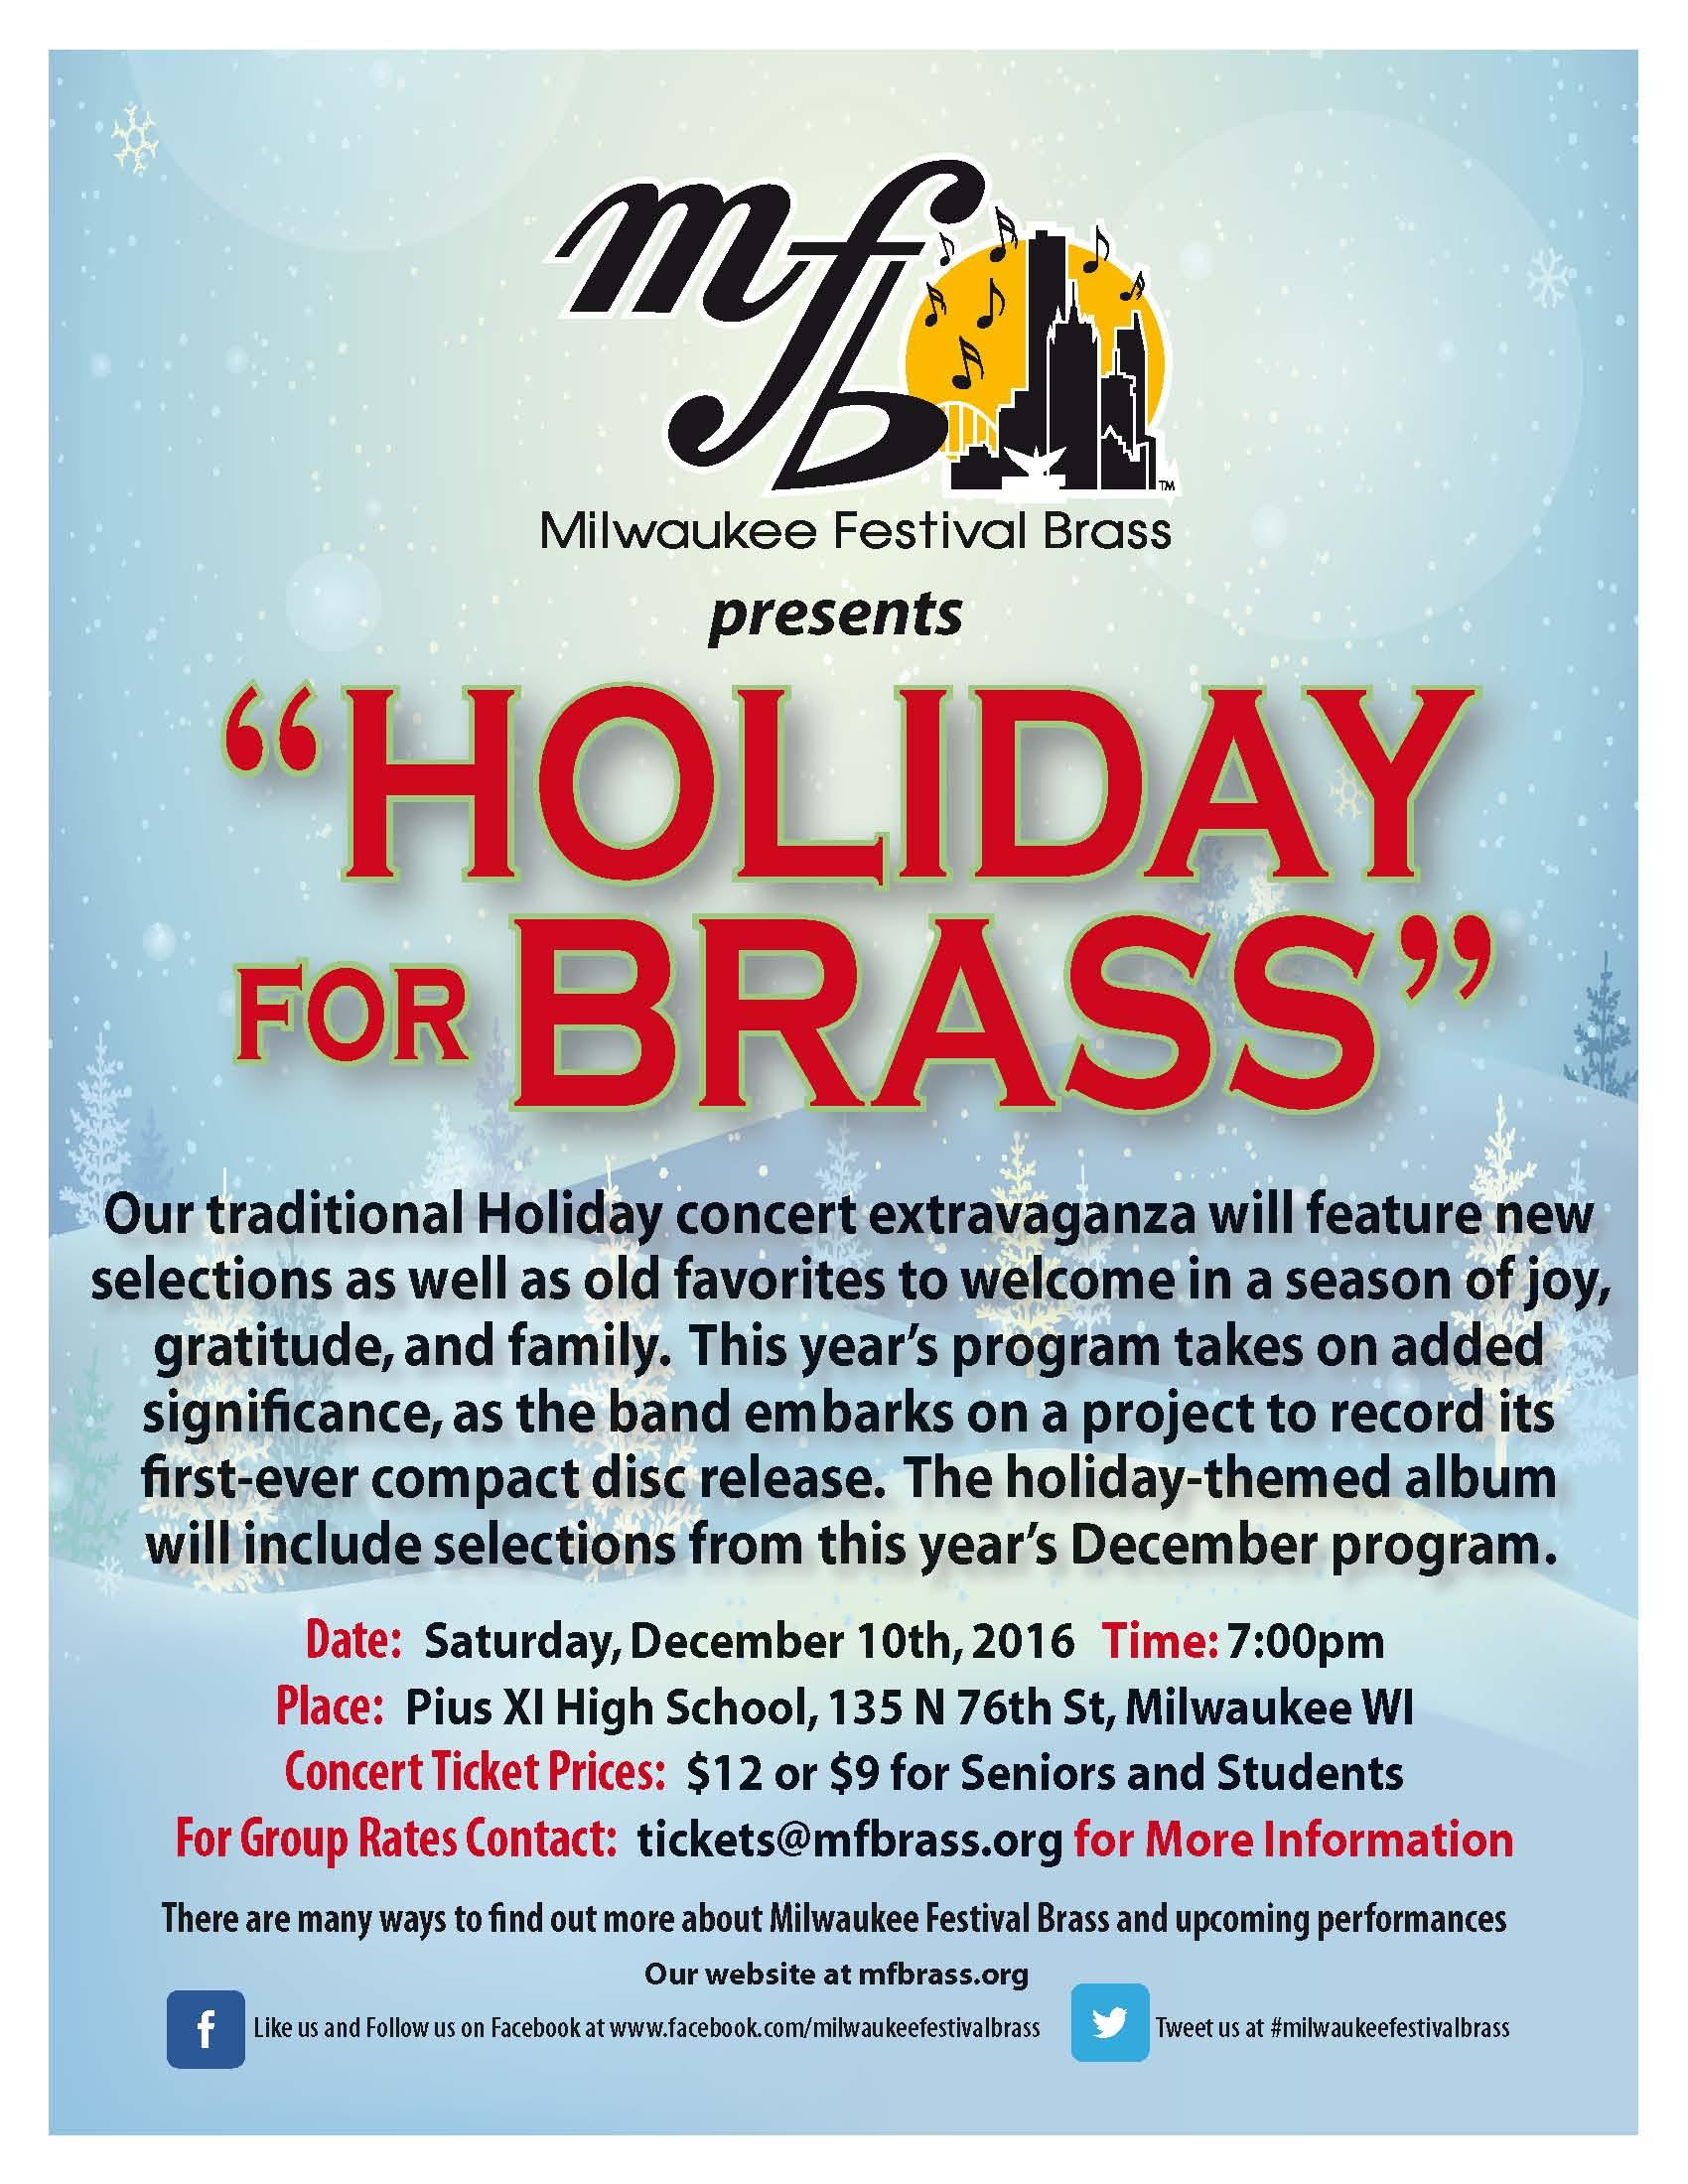 20161210-Holiday-for-Brass.jpg